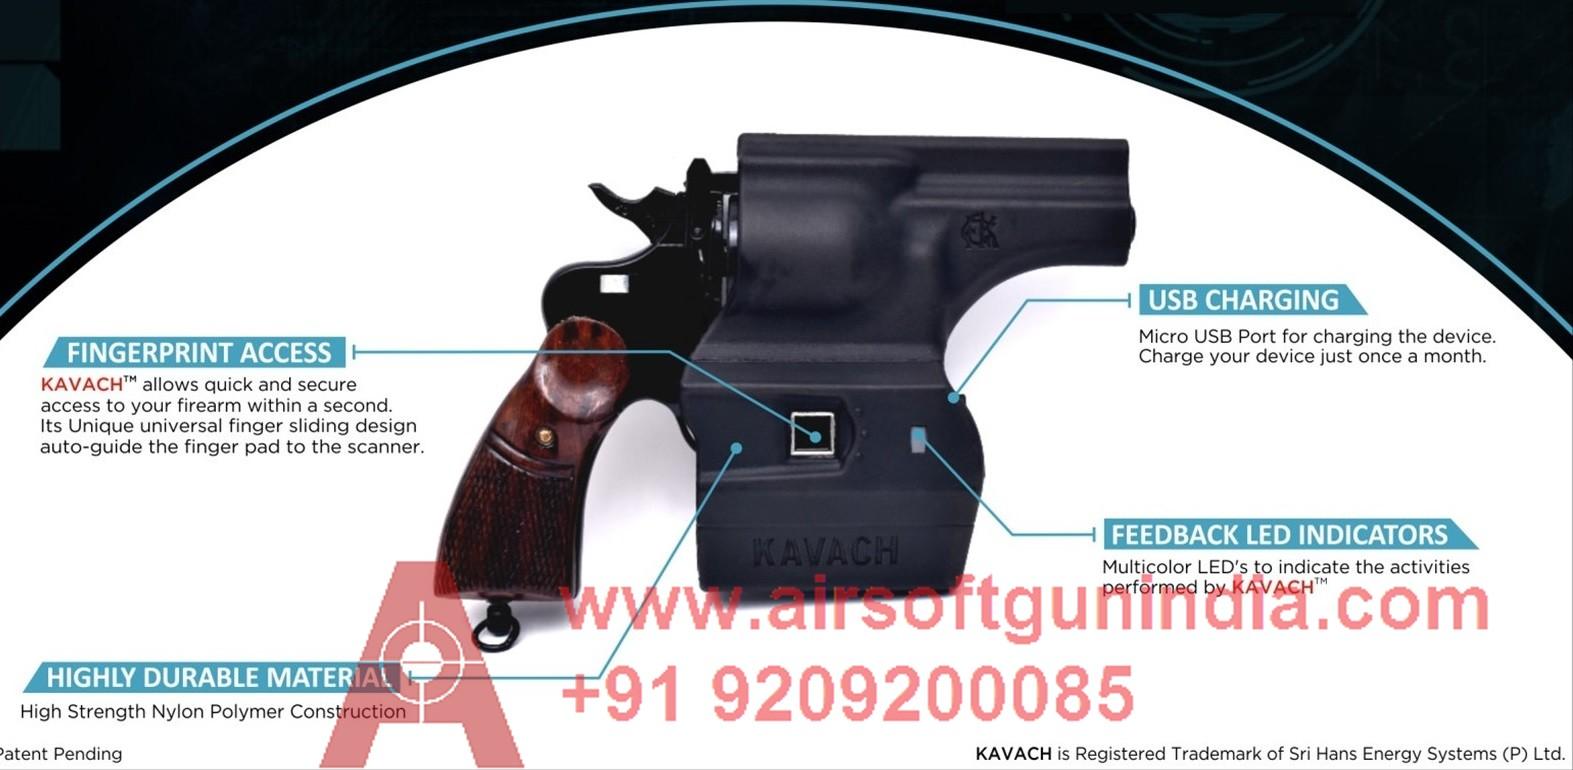 Kavach Smart Holster Fingerprint Gun Holster In India For IOF .32 Revolver By Airsoft Gun India